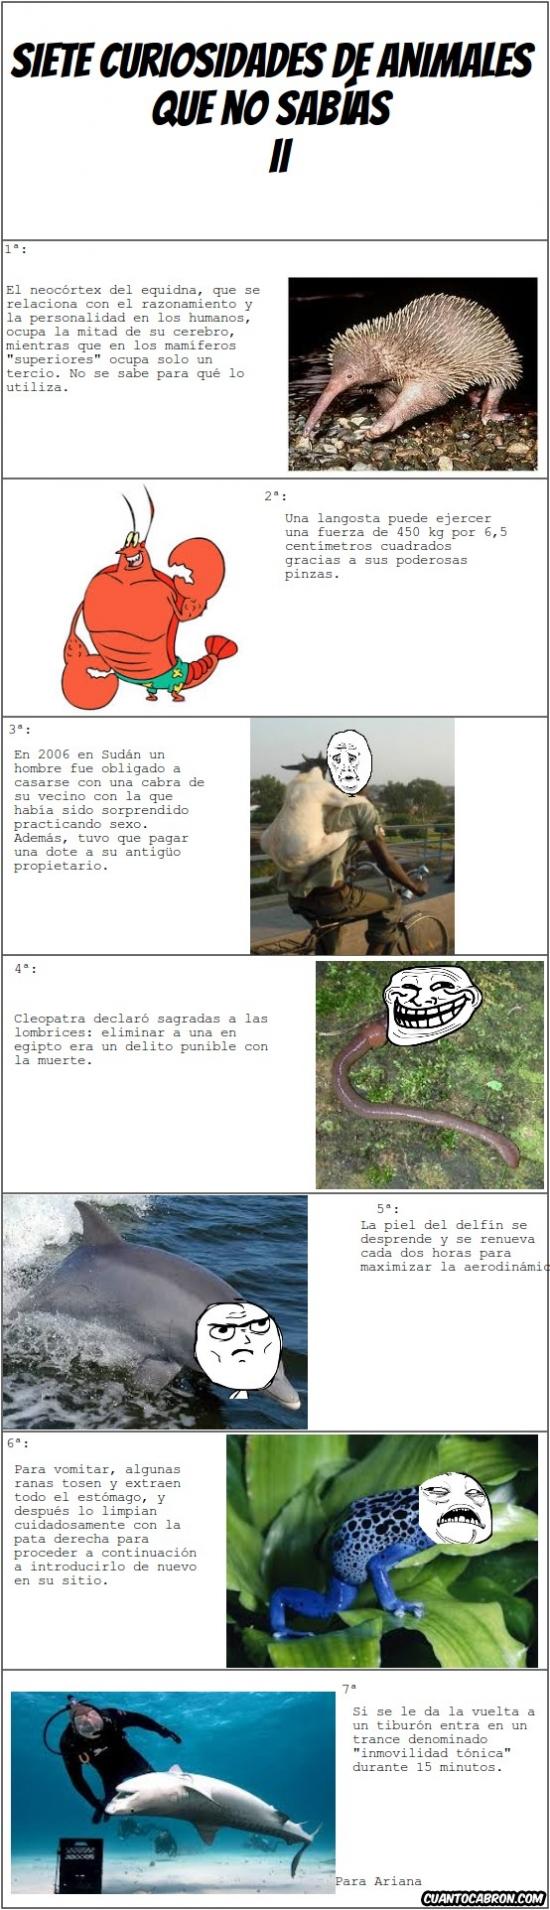 Otros - Curiosidades animales II